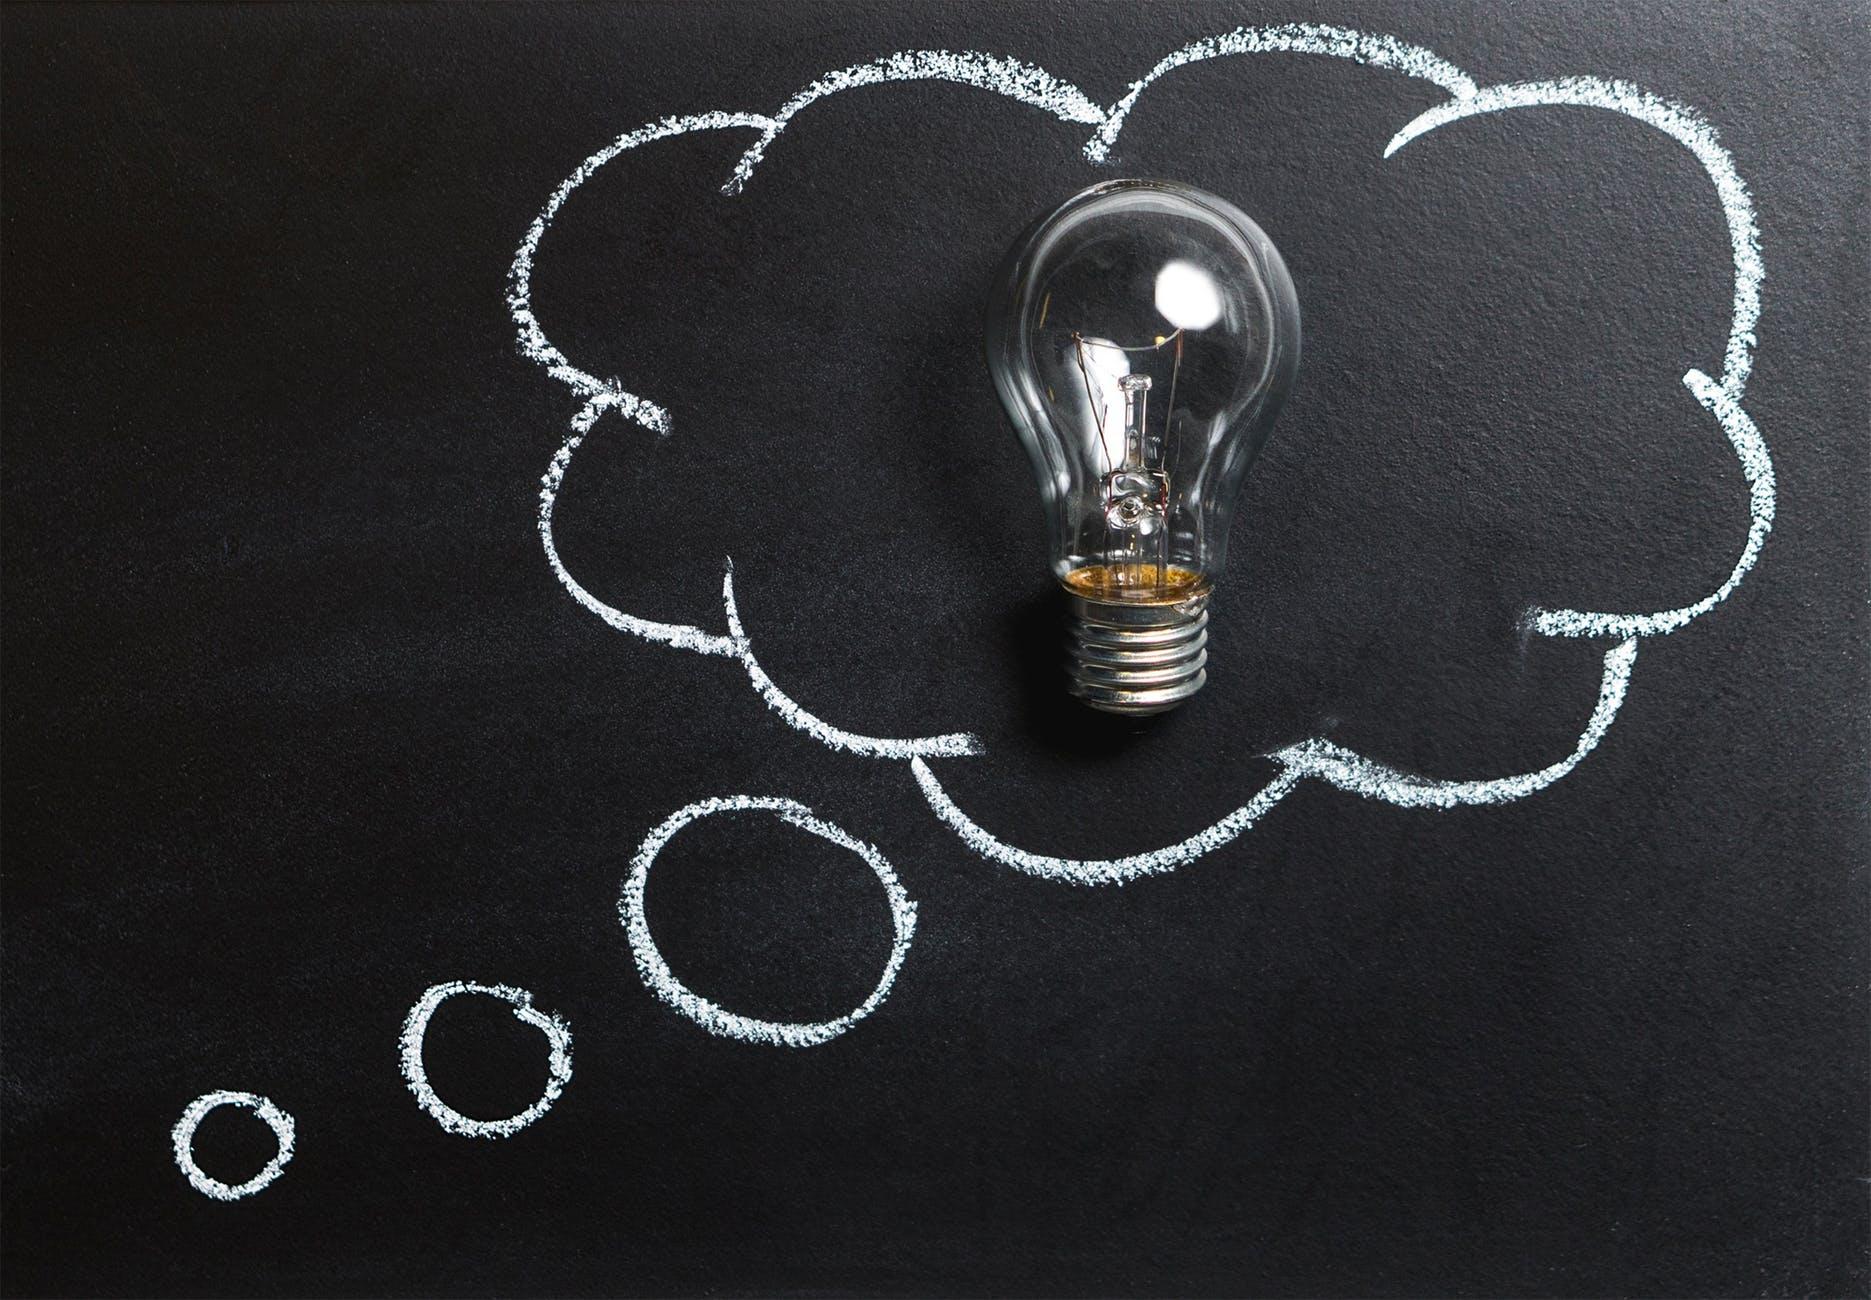 marketing dissertation ideas